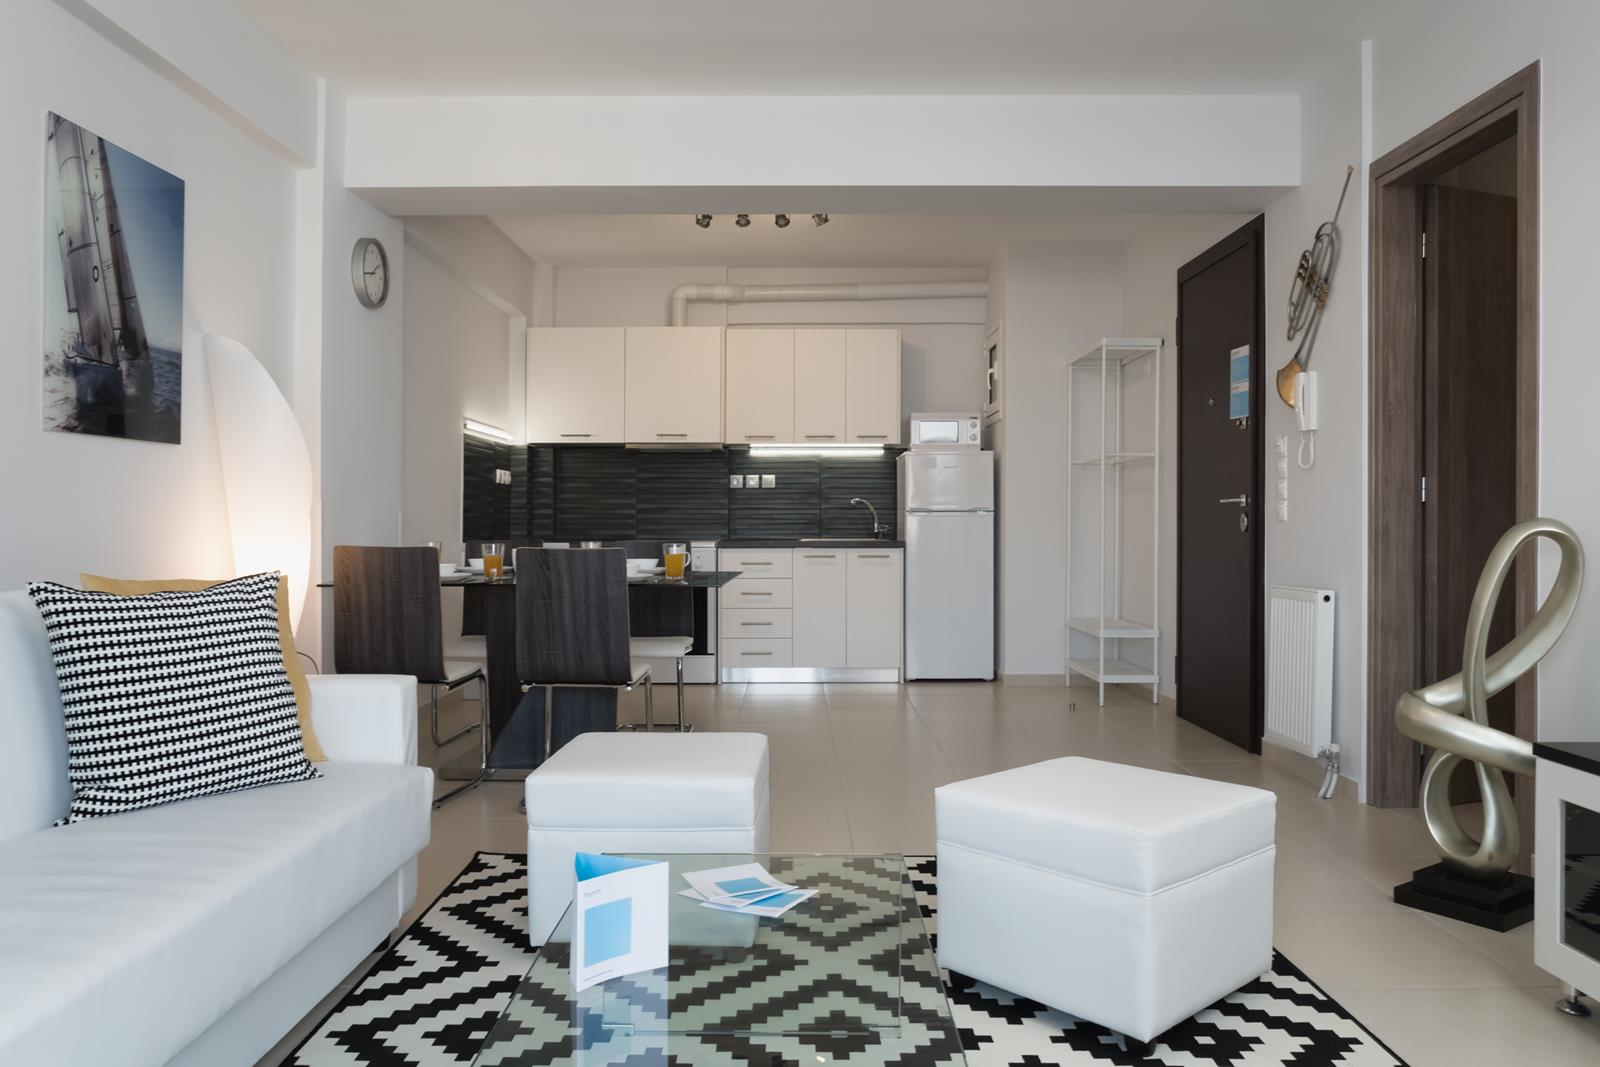 athens apartments greece - Alekos Apartments & Suites